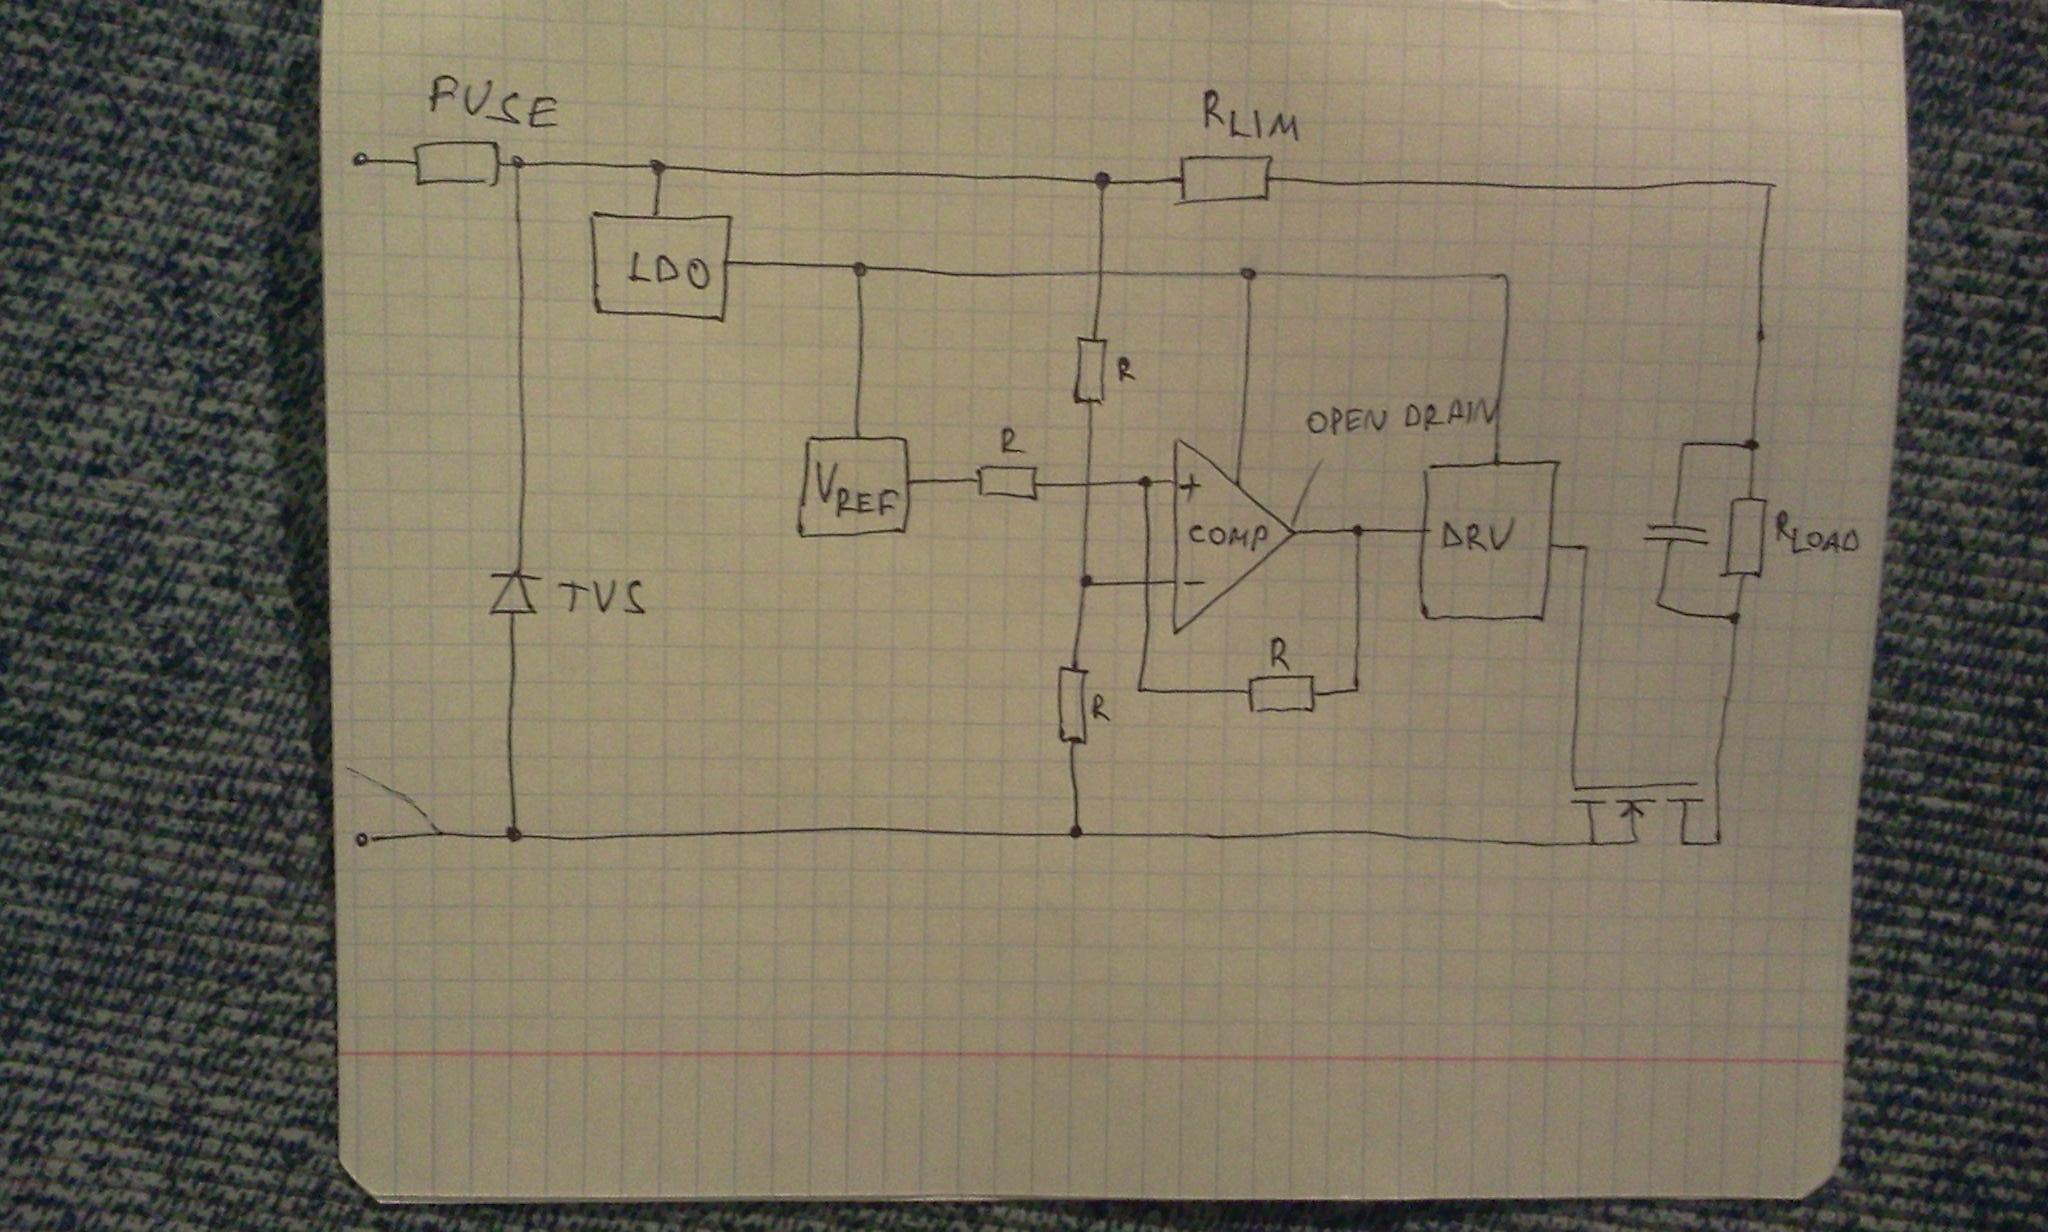 Description Of Overvoltage Protection Circuit